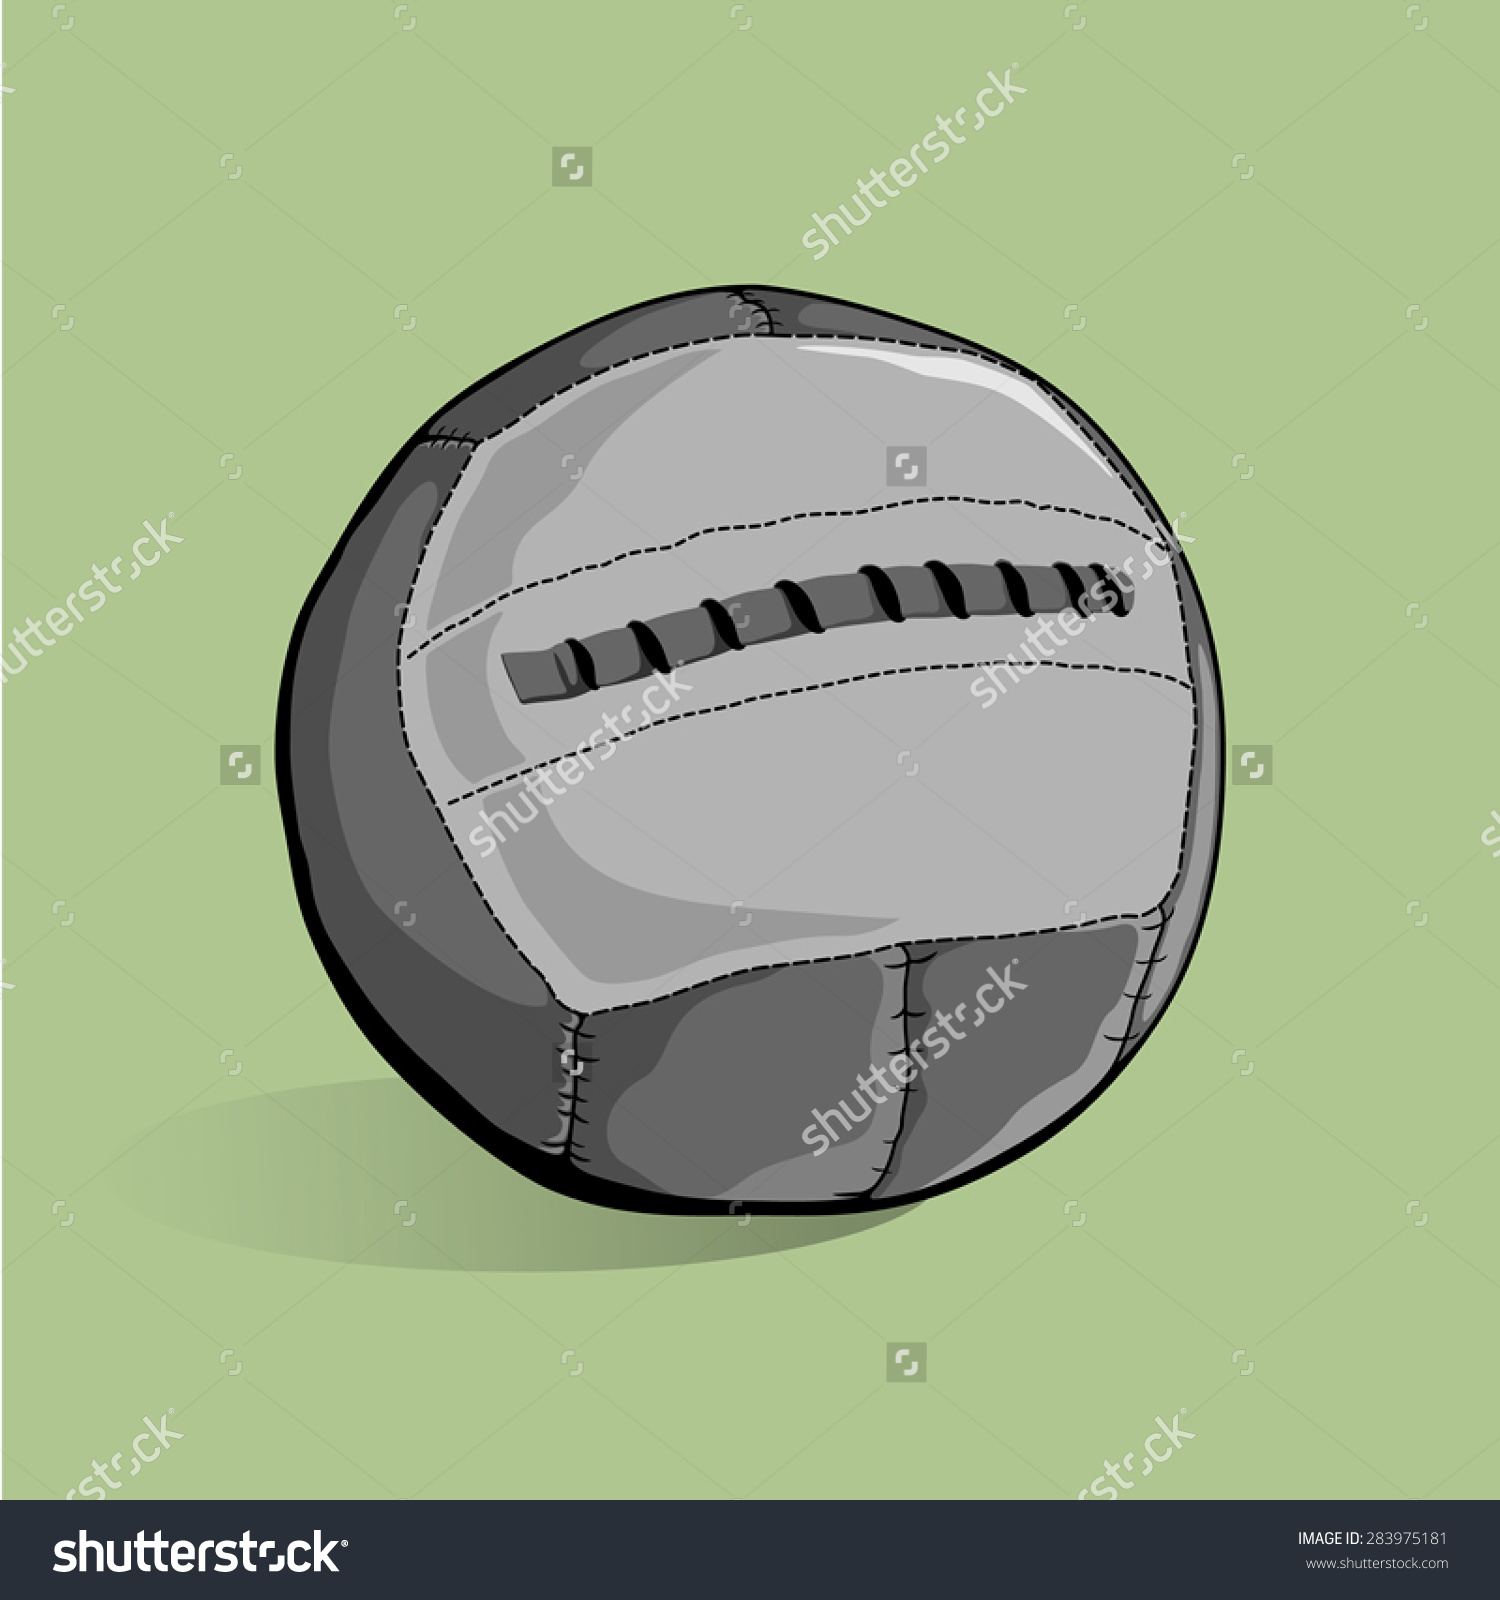 Training Workout Medicine Ball Stock Vector 283975181.